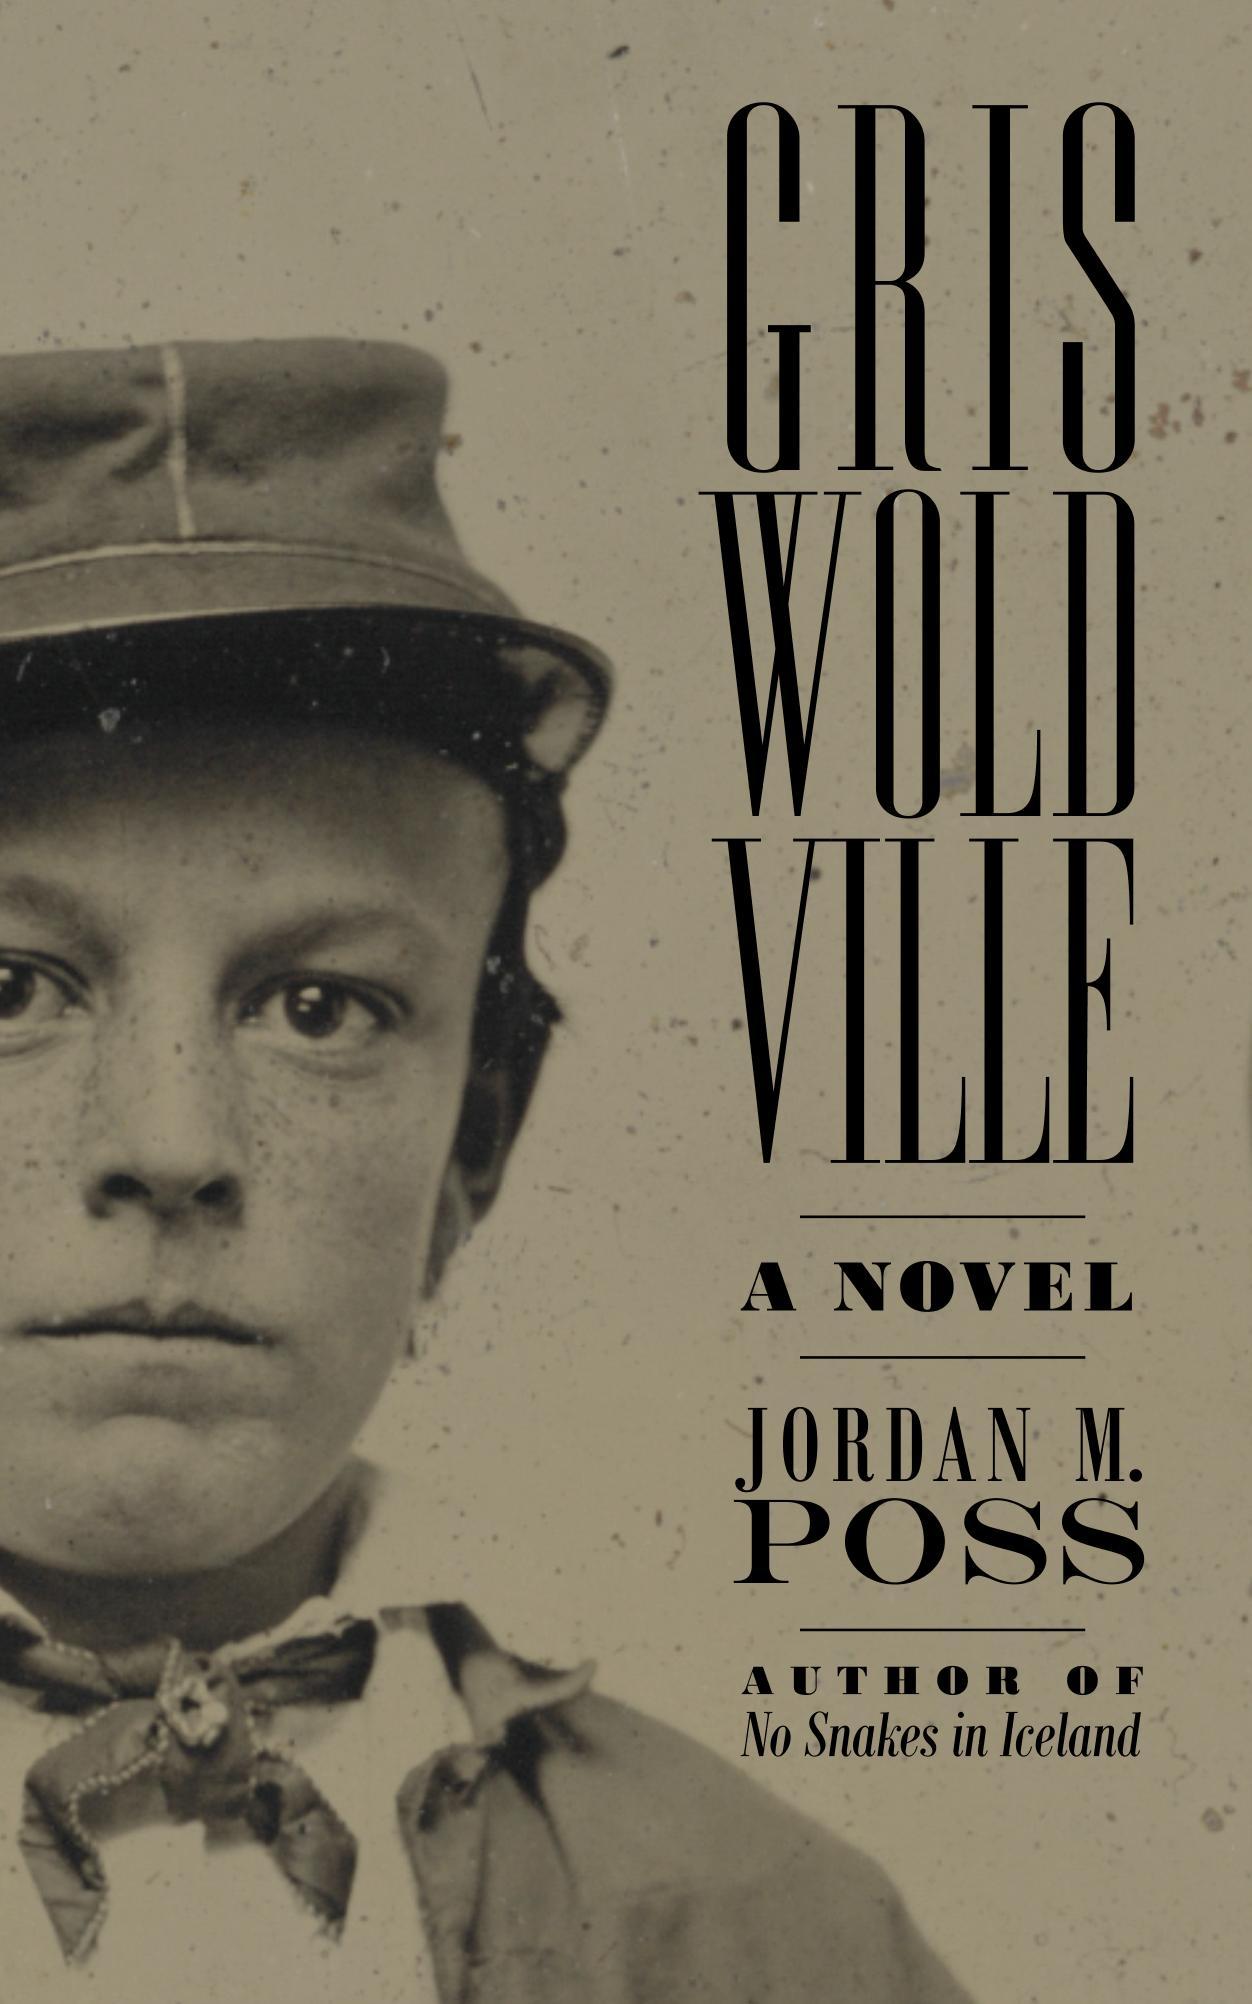 Griswoldville_Cover_for_Kindle.jpg